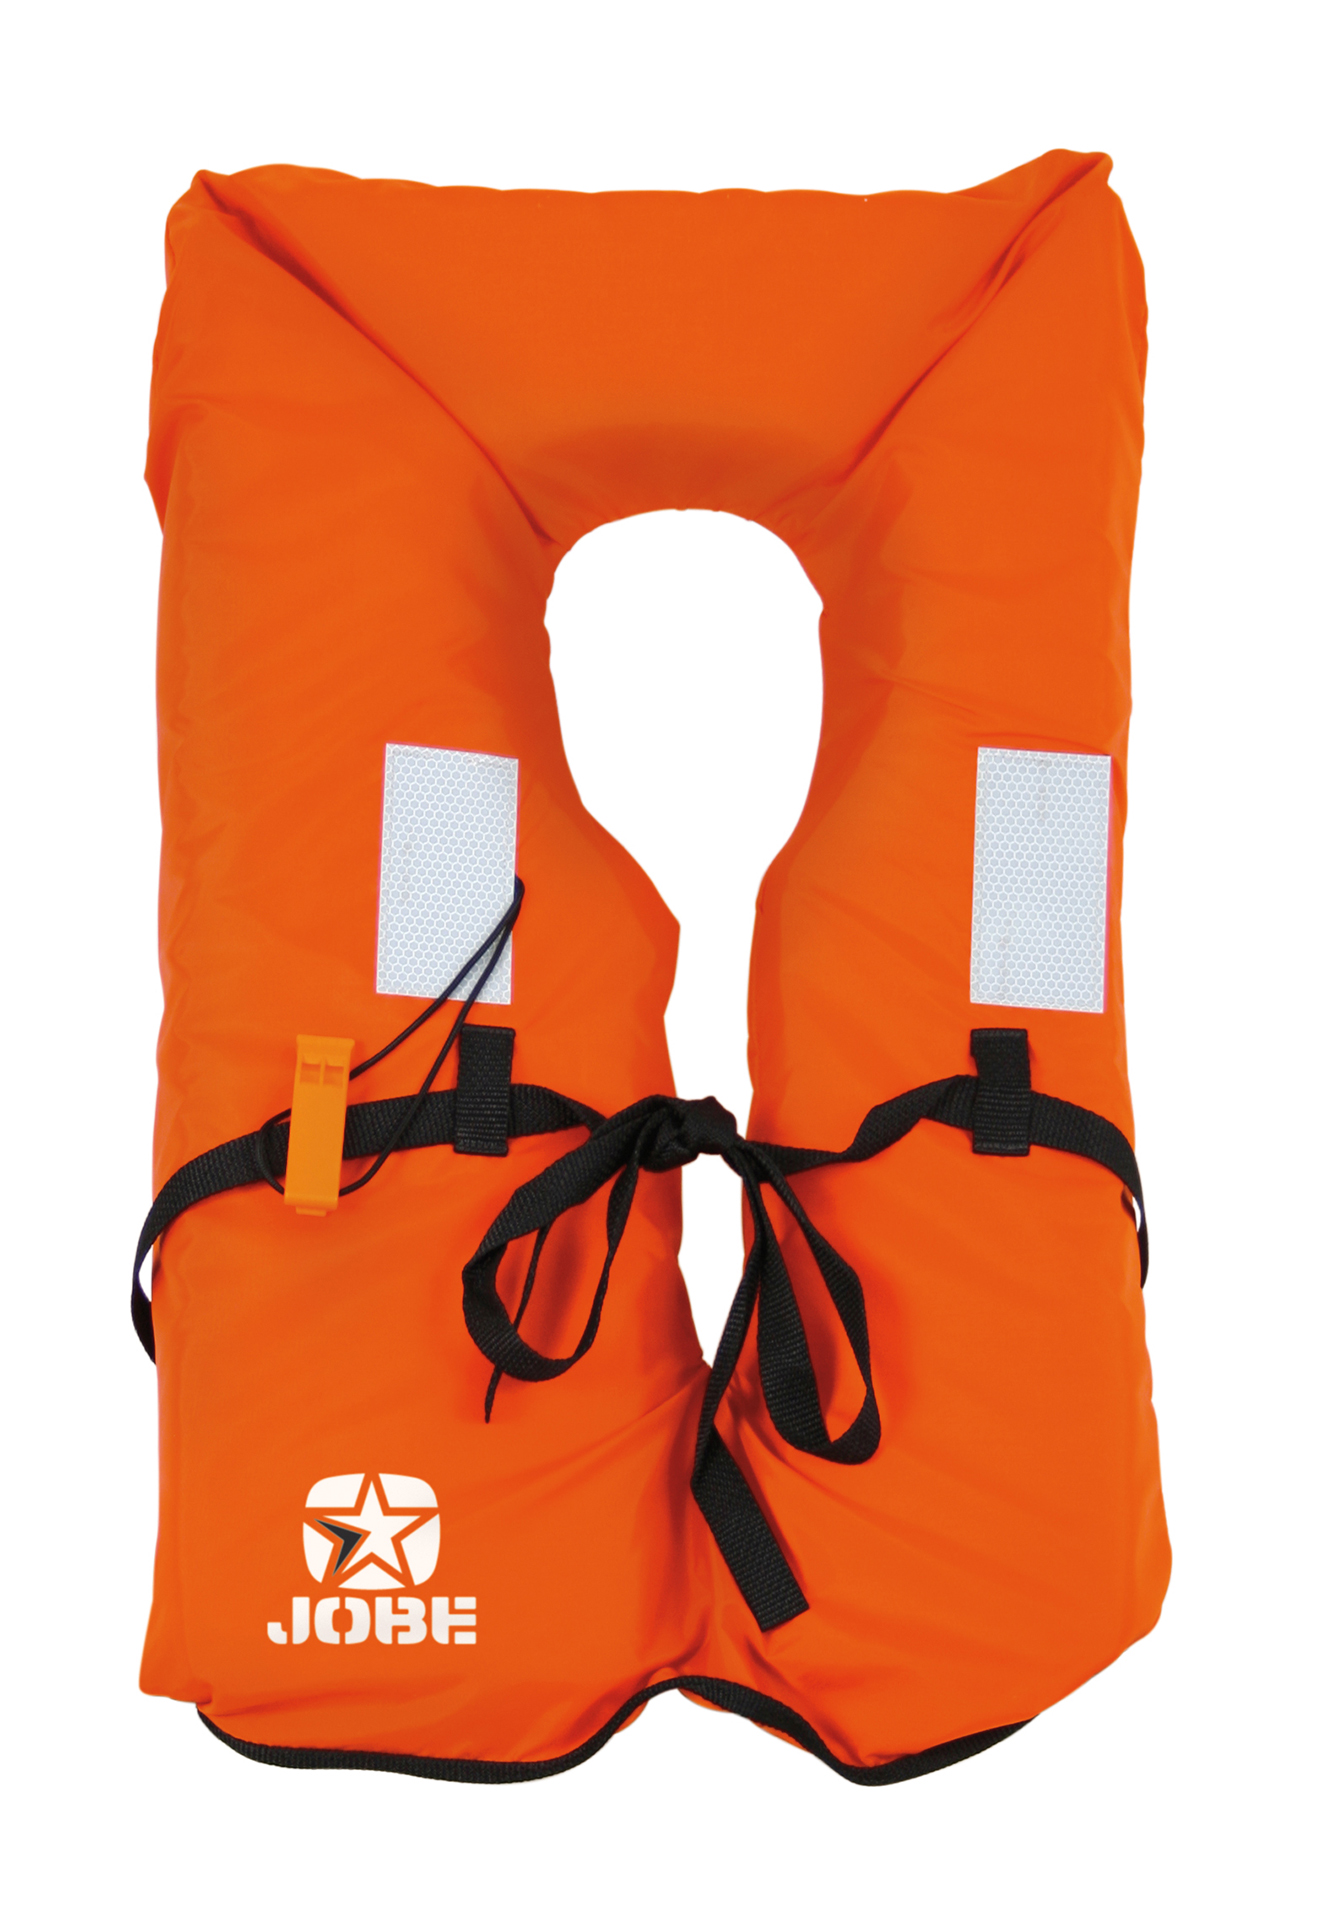 Комплект Jobe Easy Boating Package ISO, 5 жилетов в упаковке 240312002